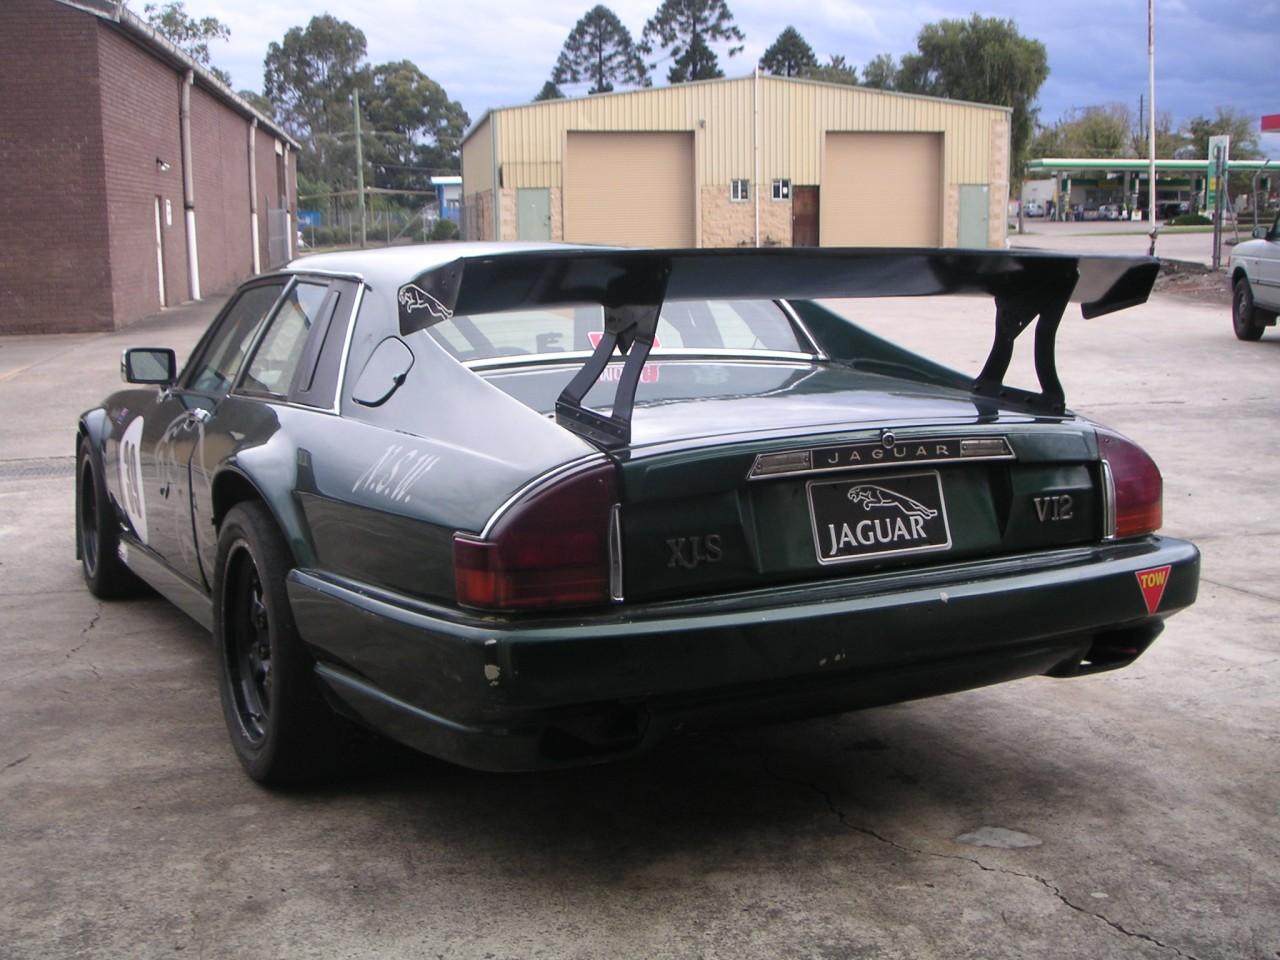 Used Jaguars For Sale >> For Sale: 1977 Jaguar XJS V12 twin-turbo race car ...